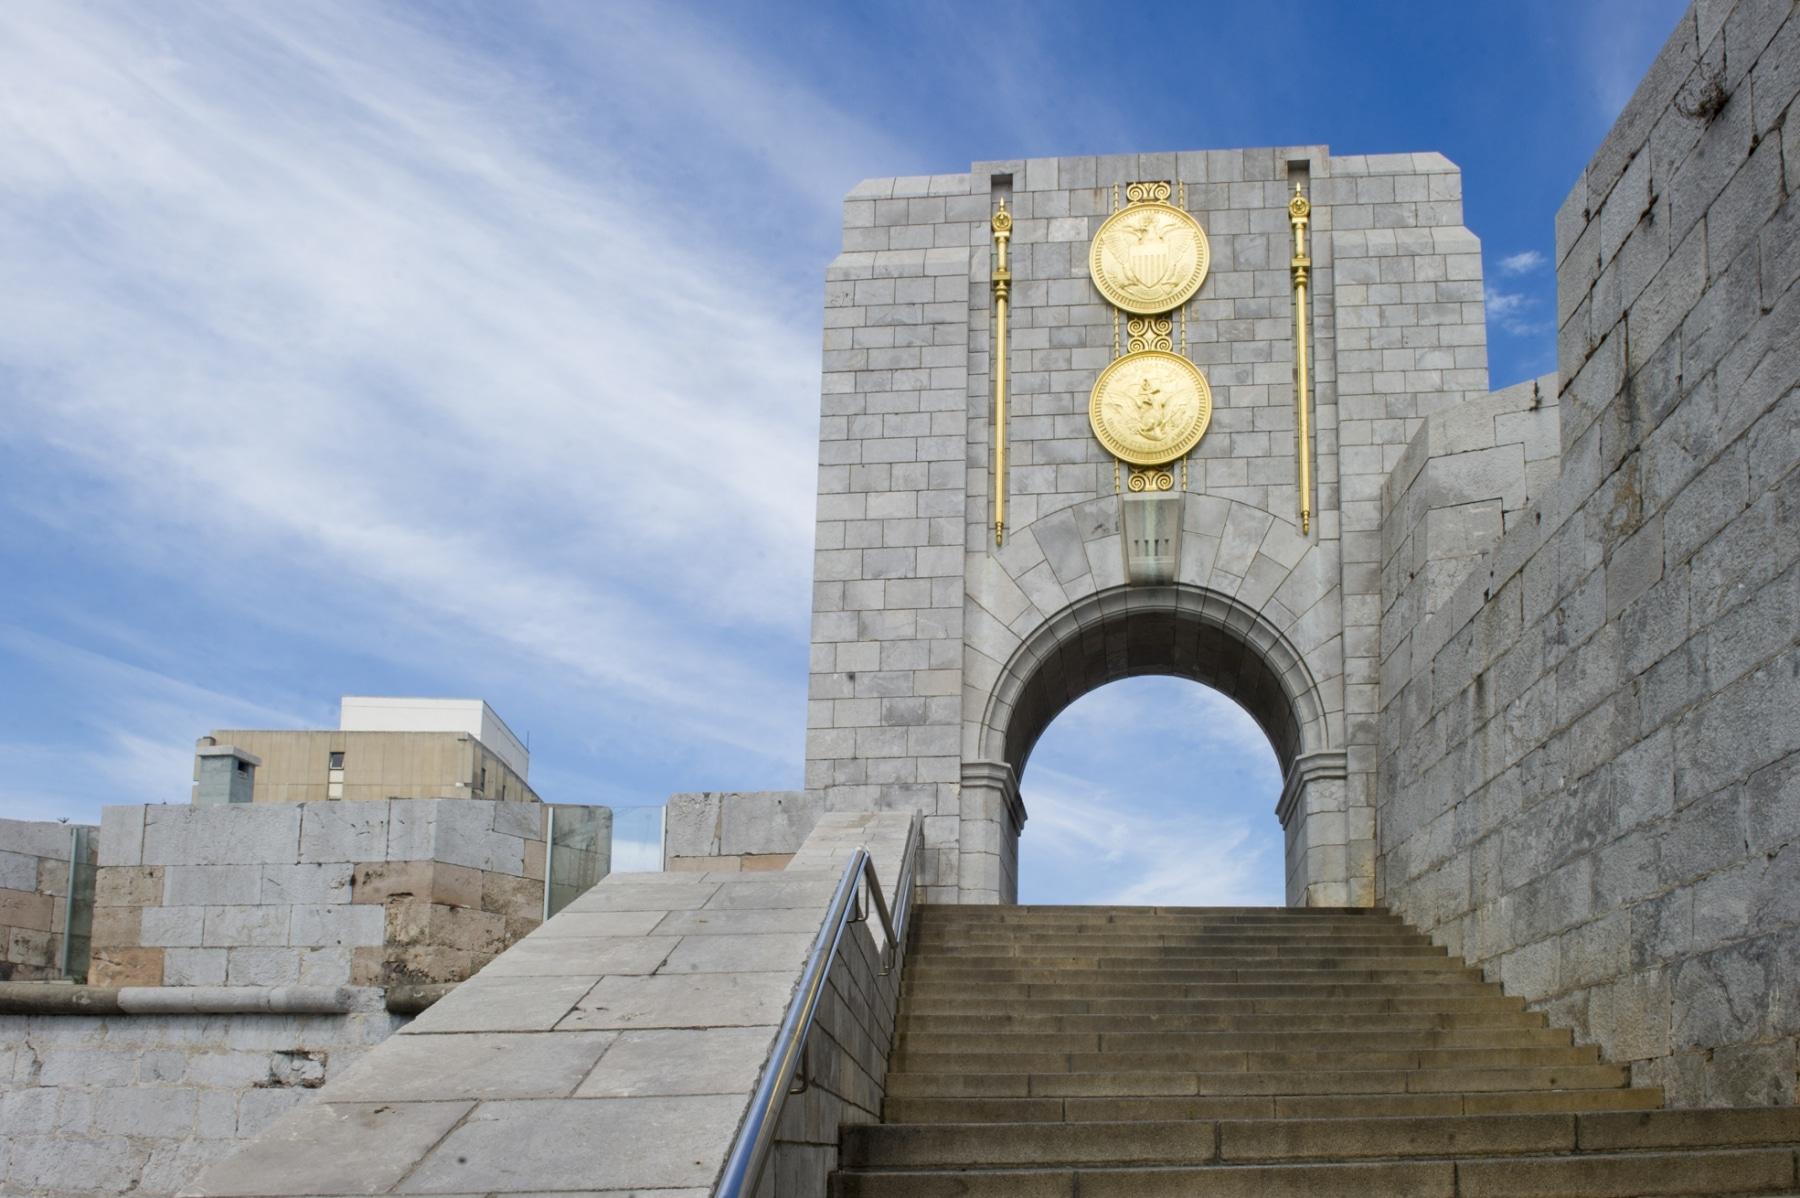 memorial-en-honor-a-los-cados-estadounidenses-en-gibraltar-durante-la-i-guerra-mundial_22740094345_o